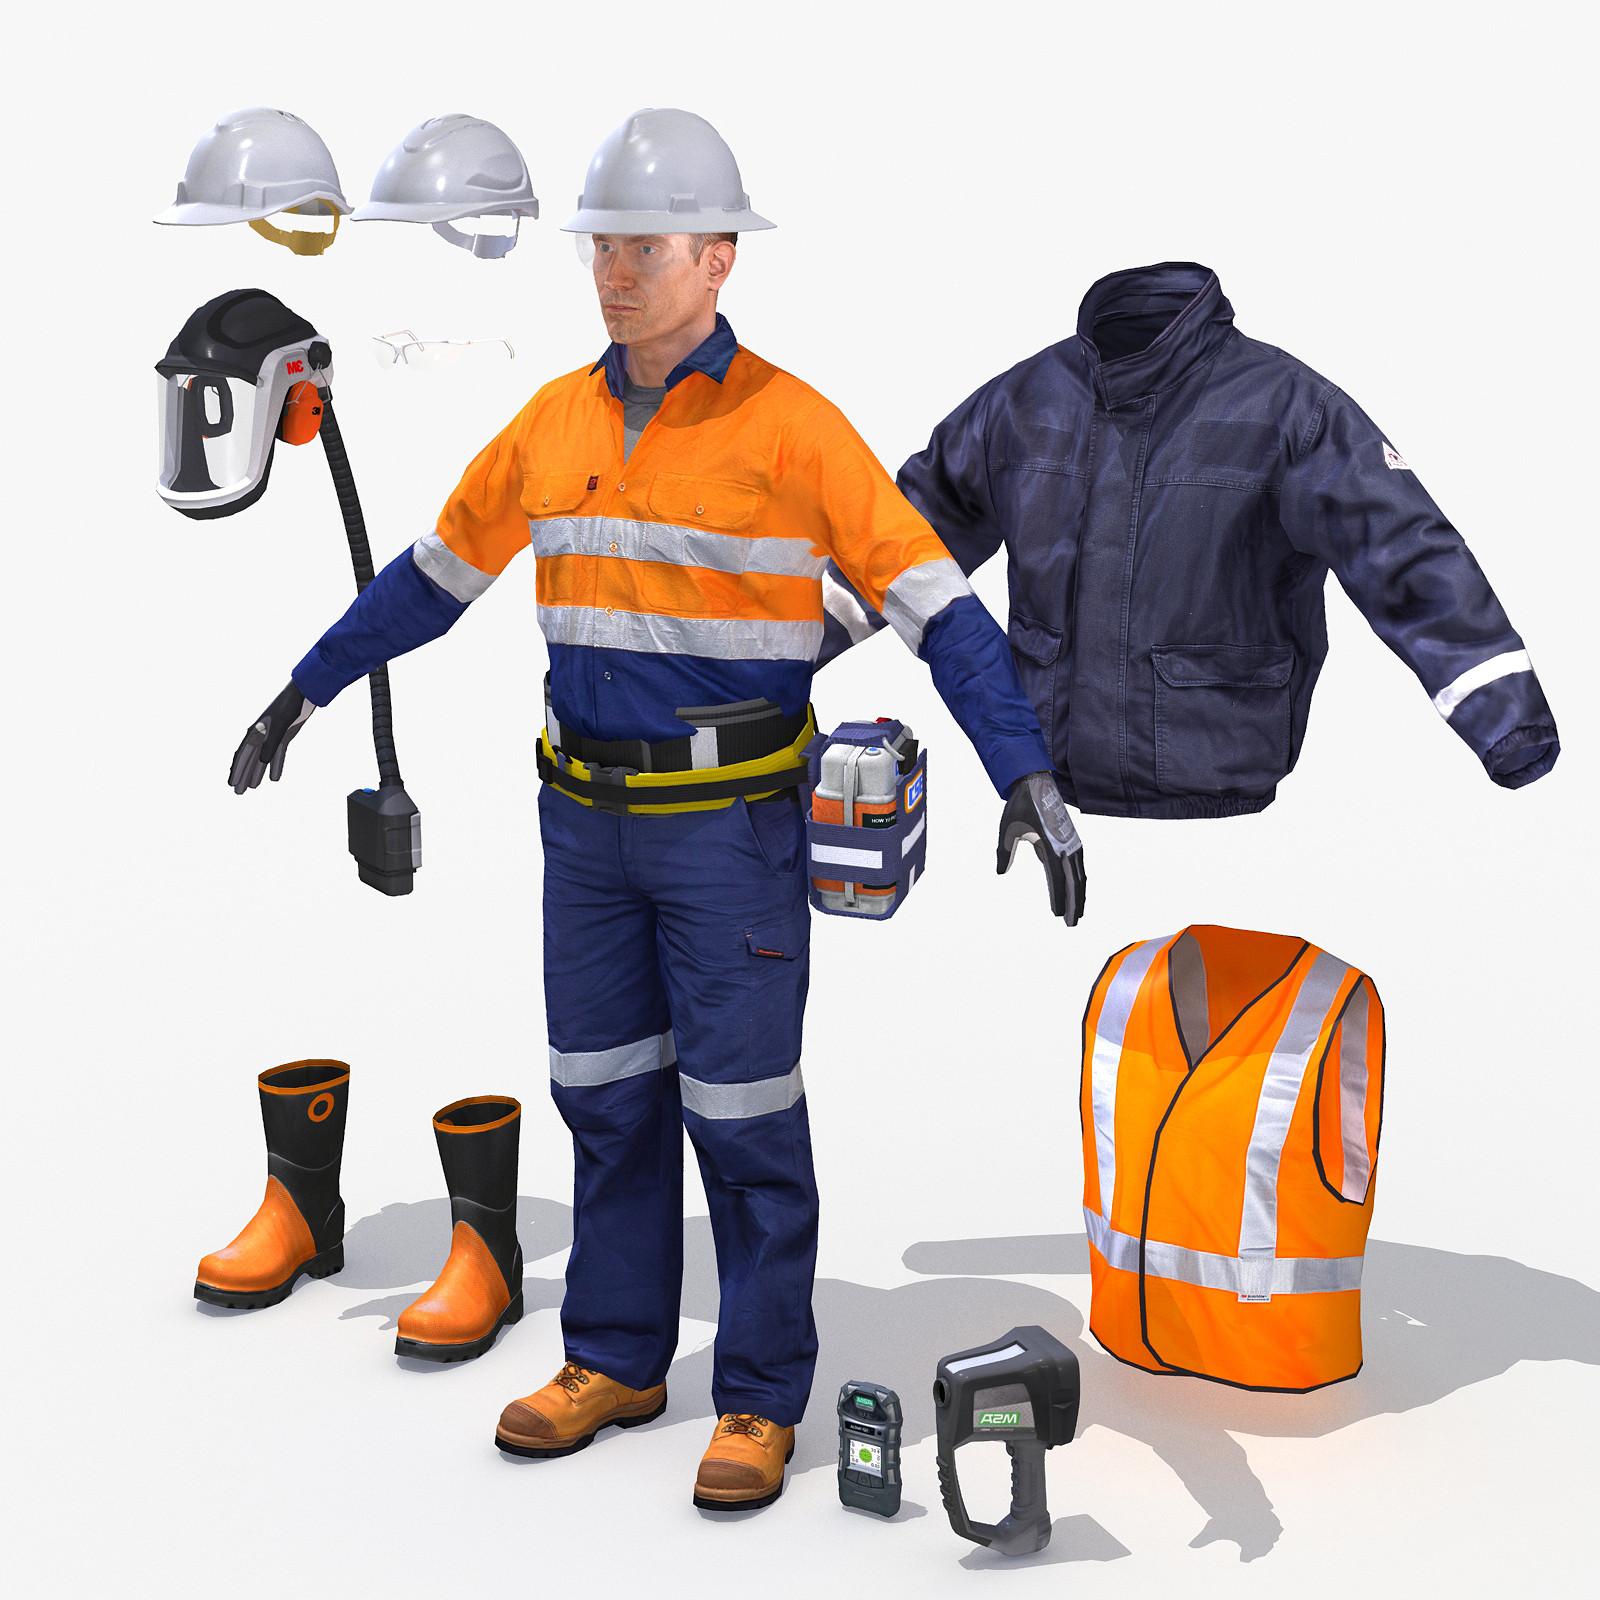 3D_Mining_Safety_Worker_all_01.jpg